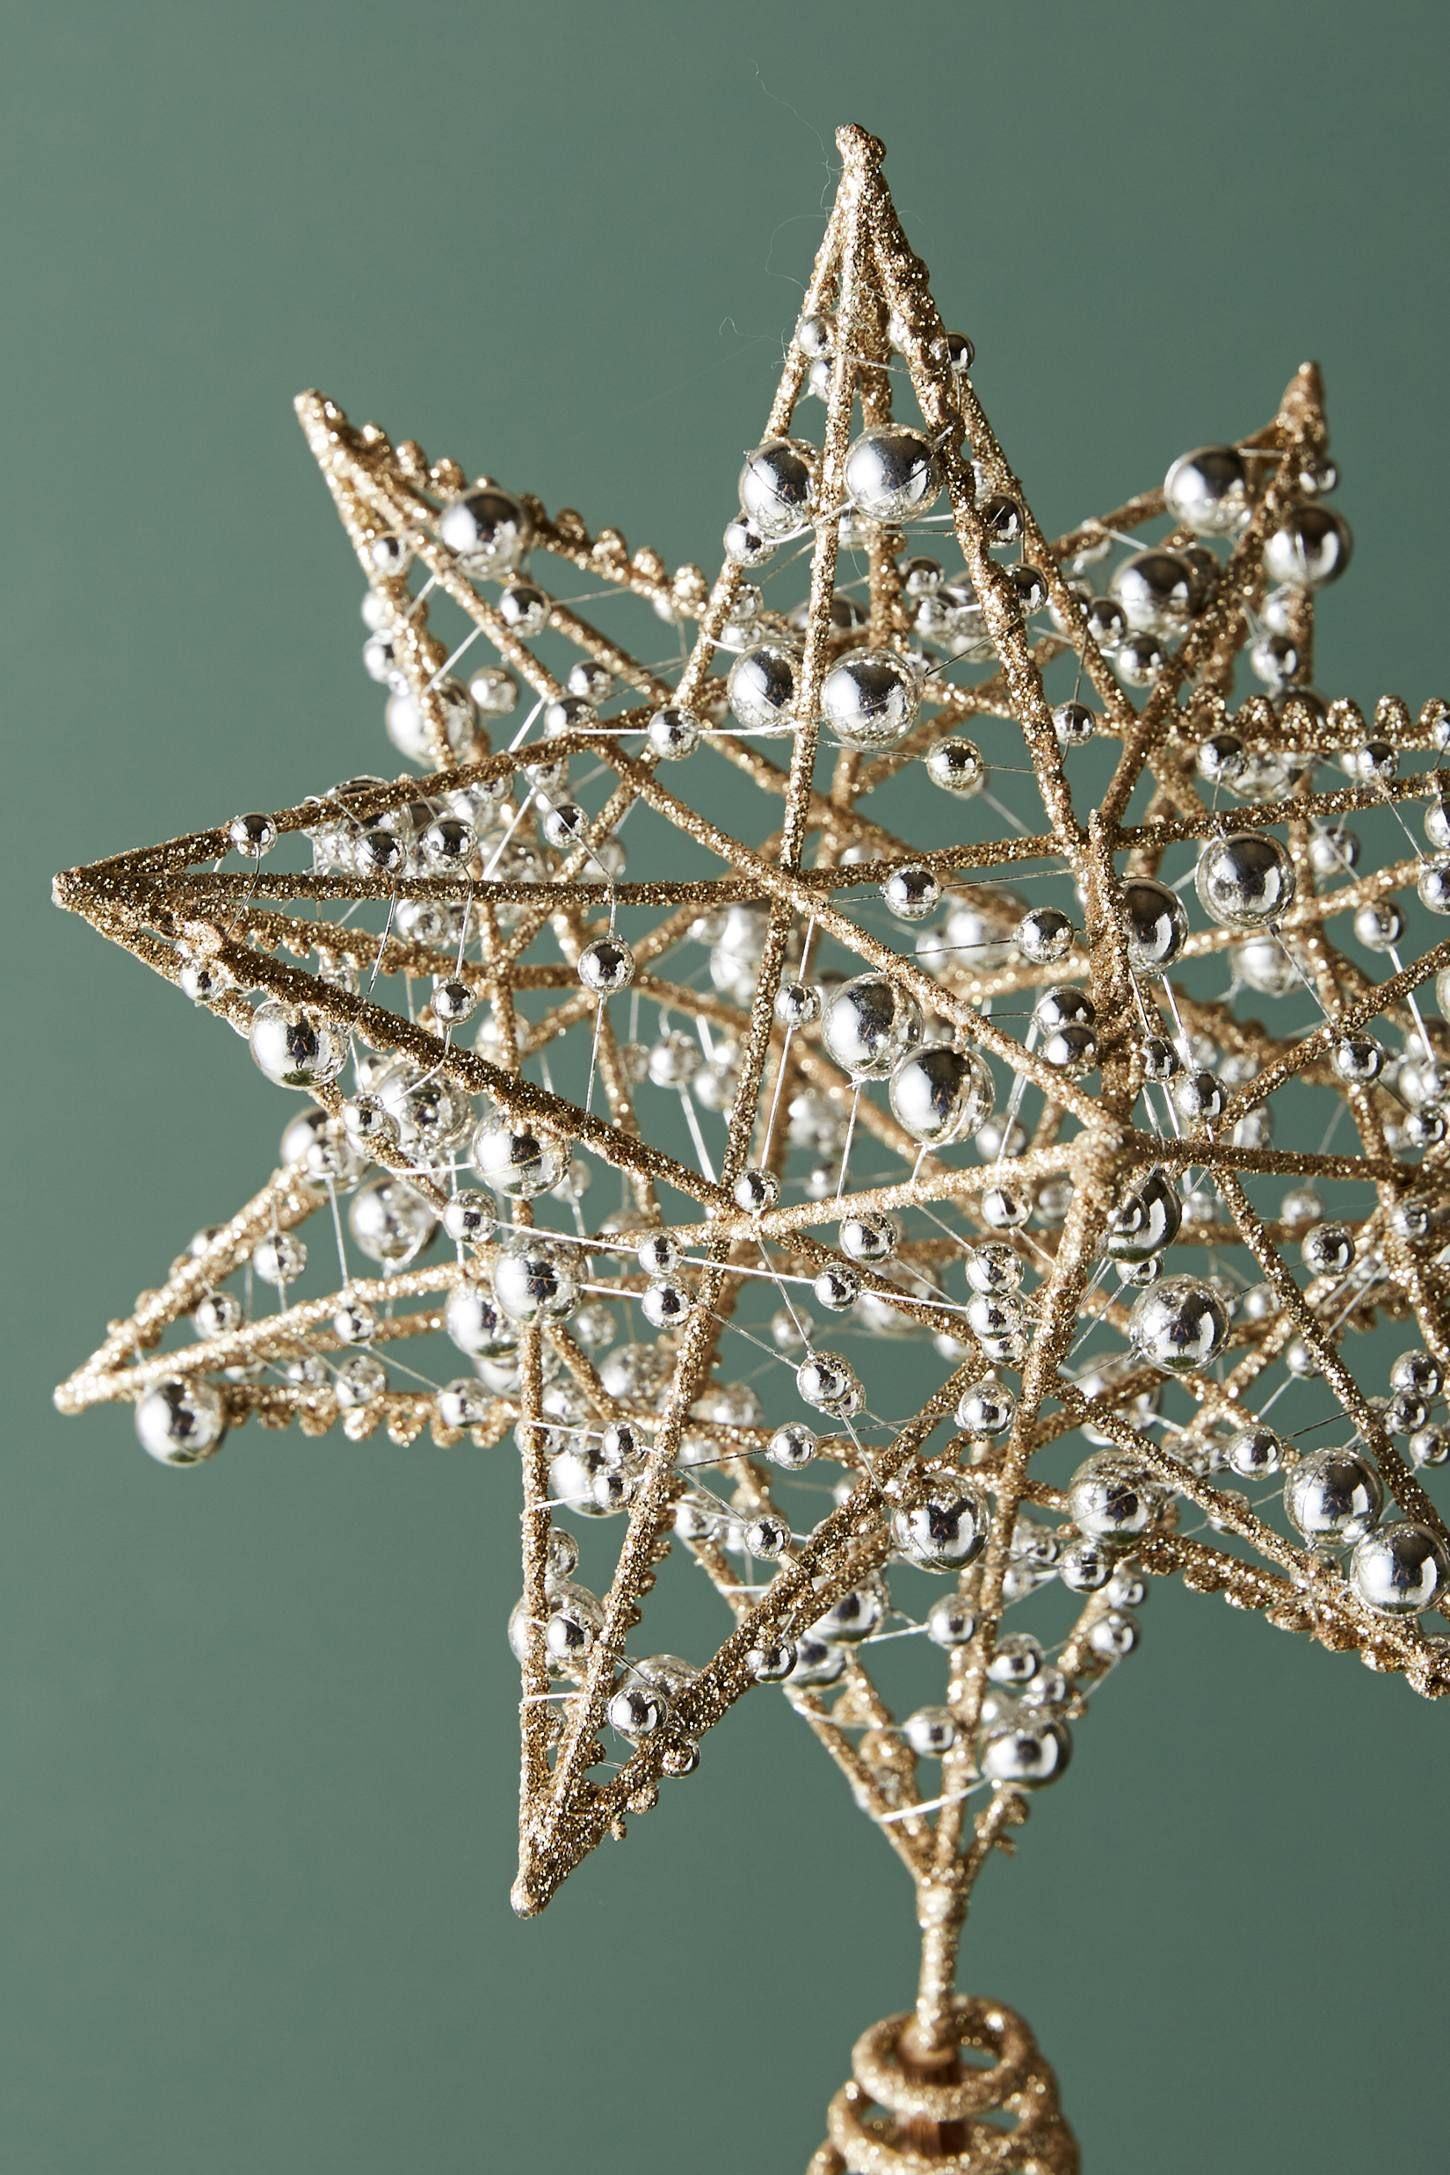 Slide View: 2: Dew-Sprinkled Star Tree Topper